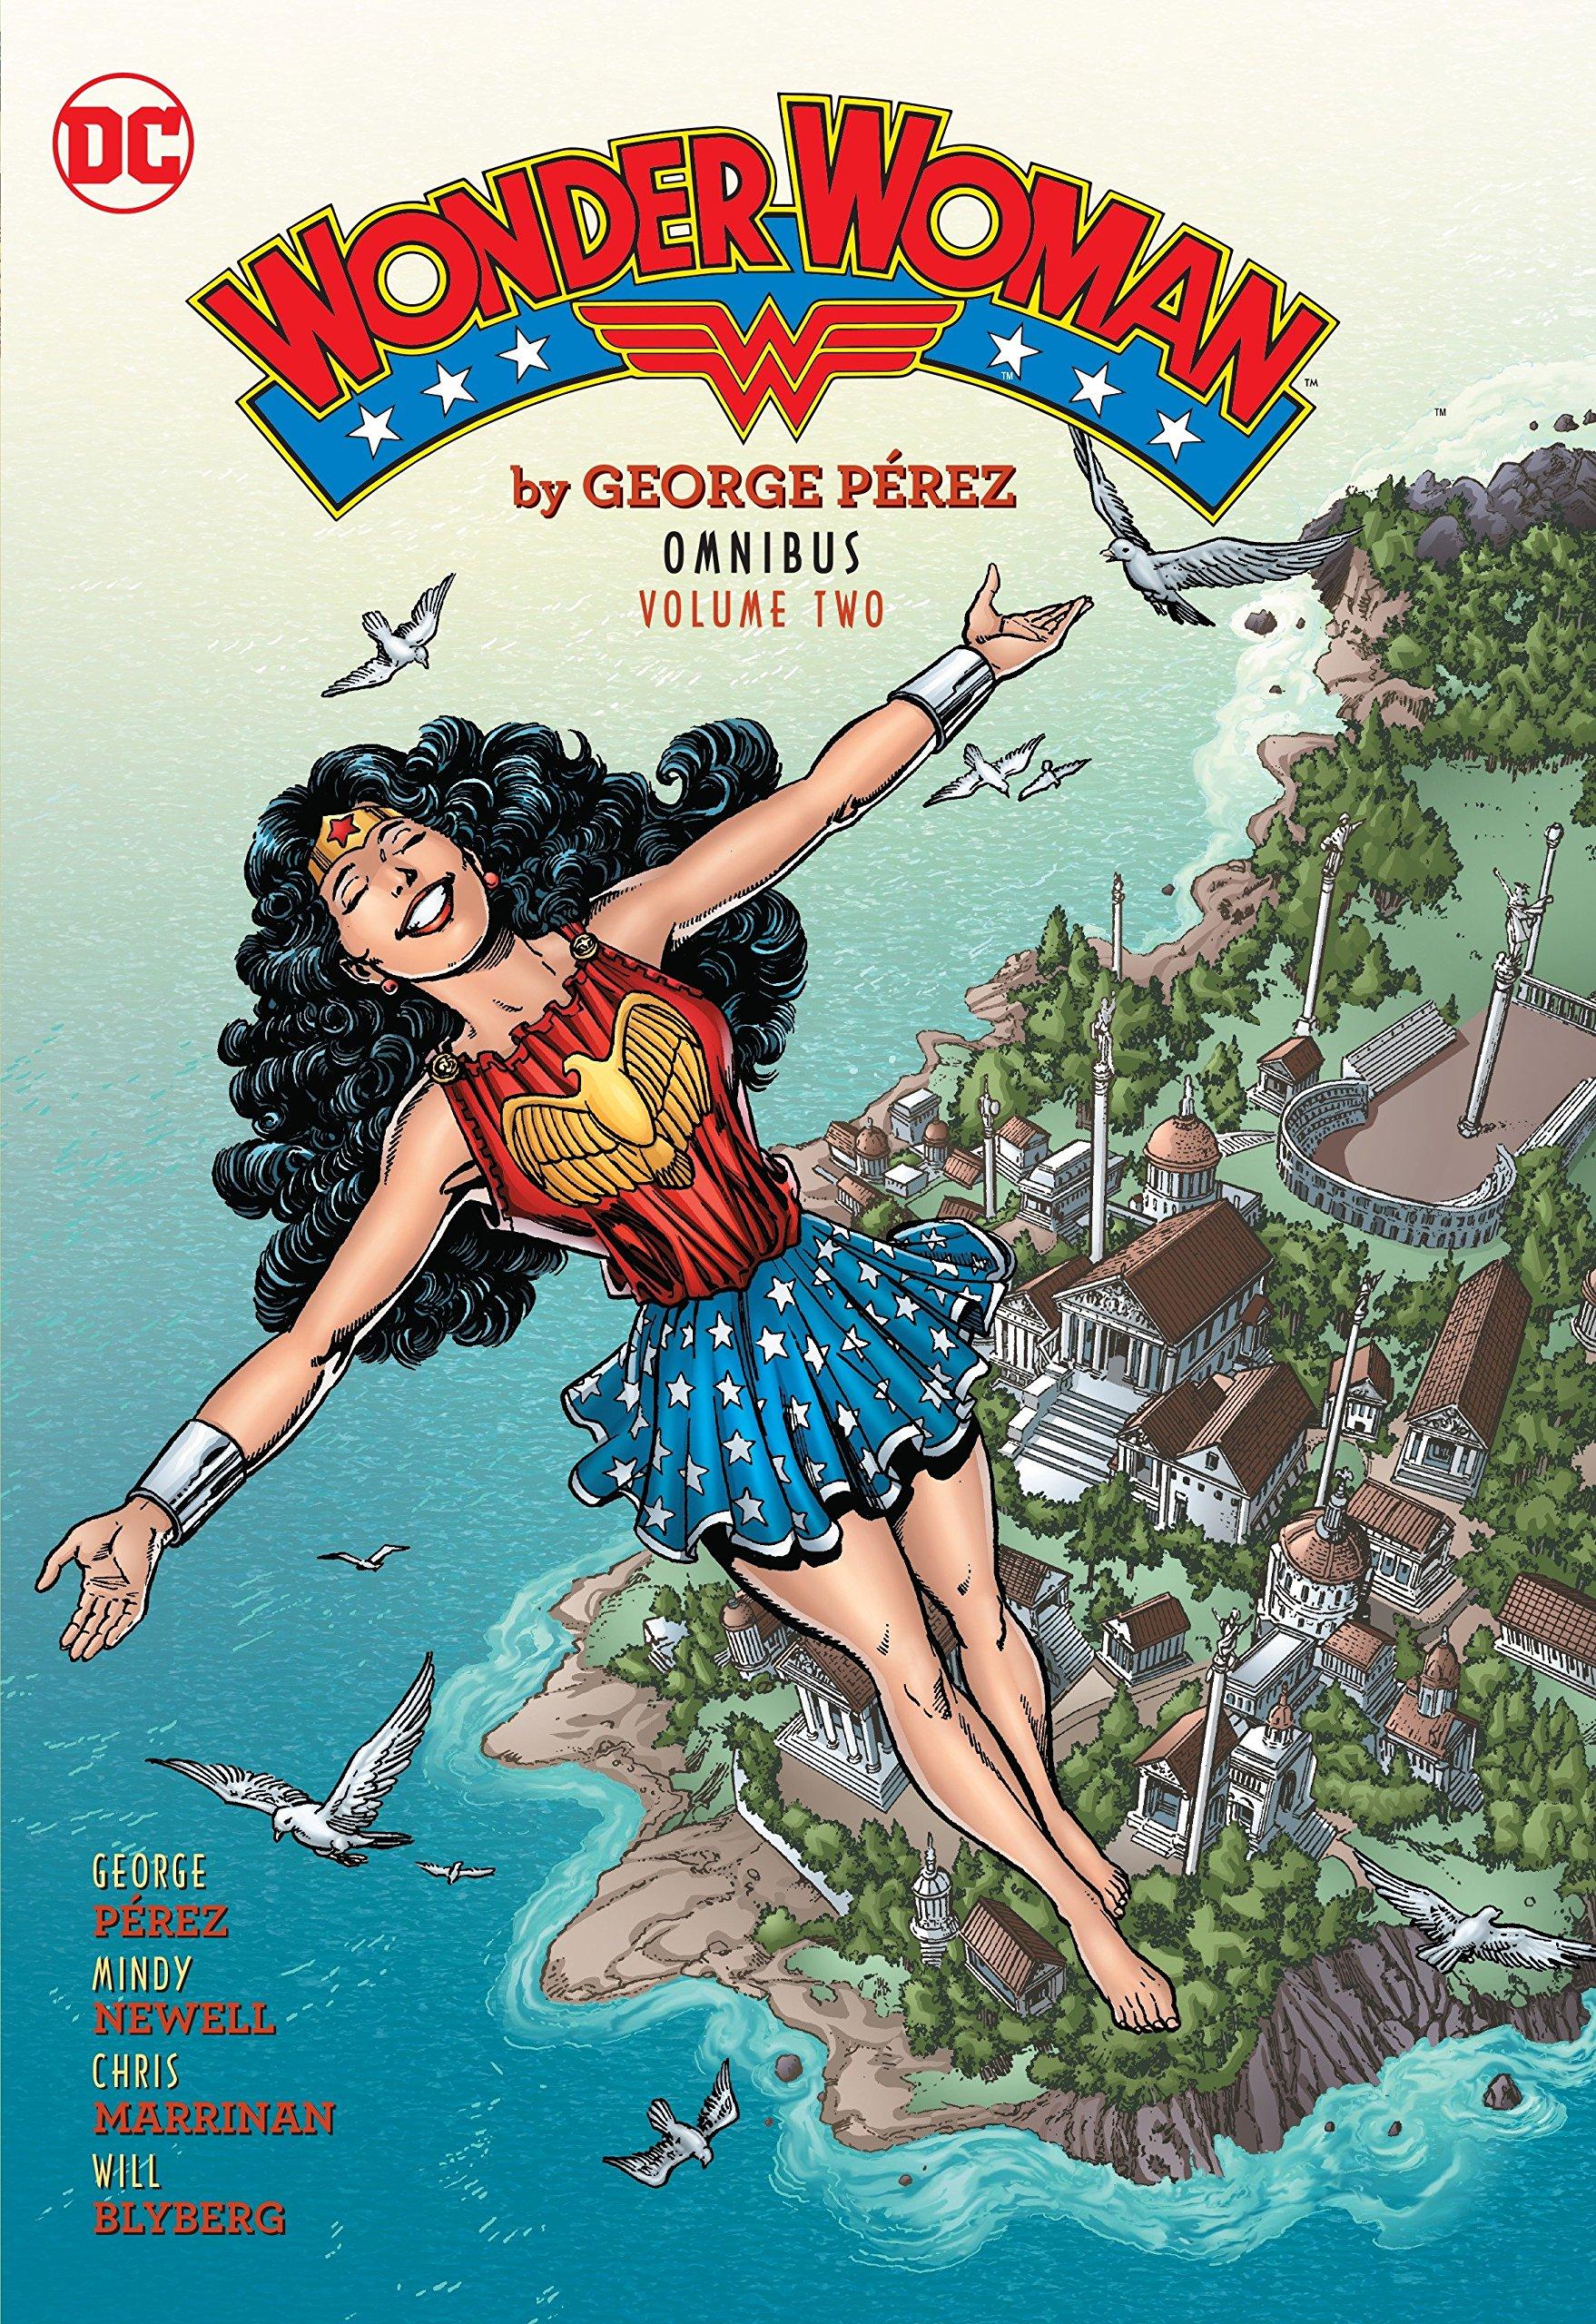 Wonder Woman By George Perez Omnibus Vol. 2 (Wonder Woman Omnibus) by DC Comics